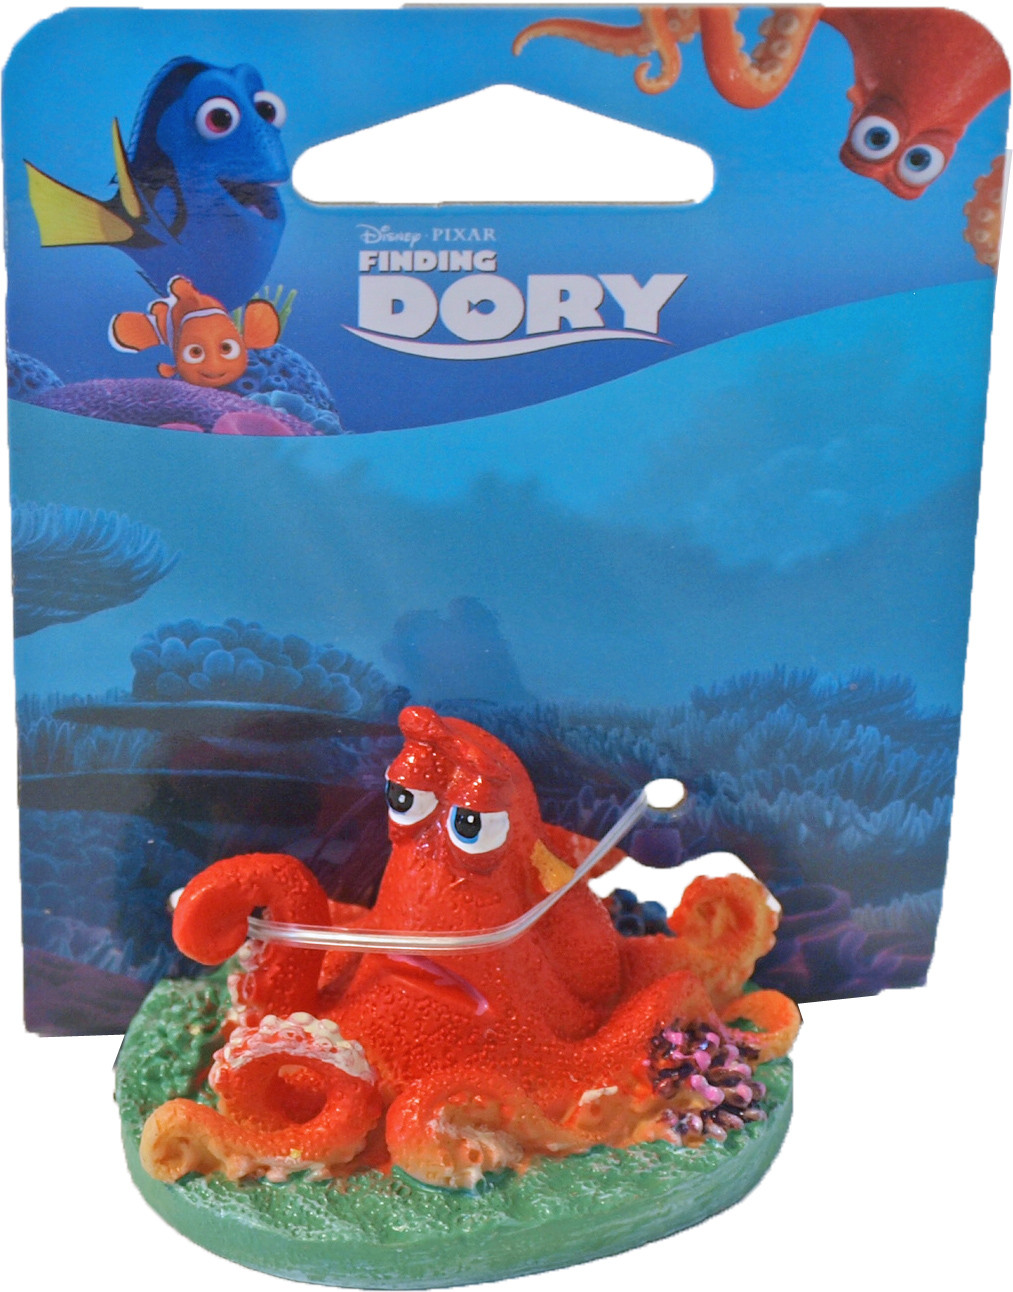 Penn Plax Dory ornament mini Hank with coral